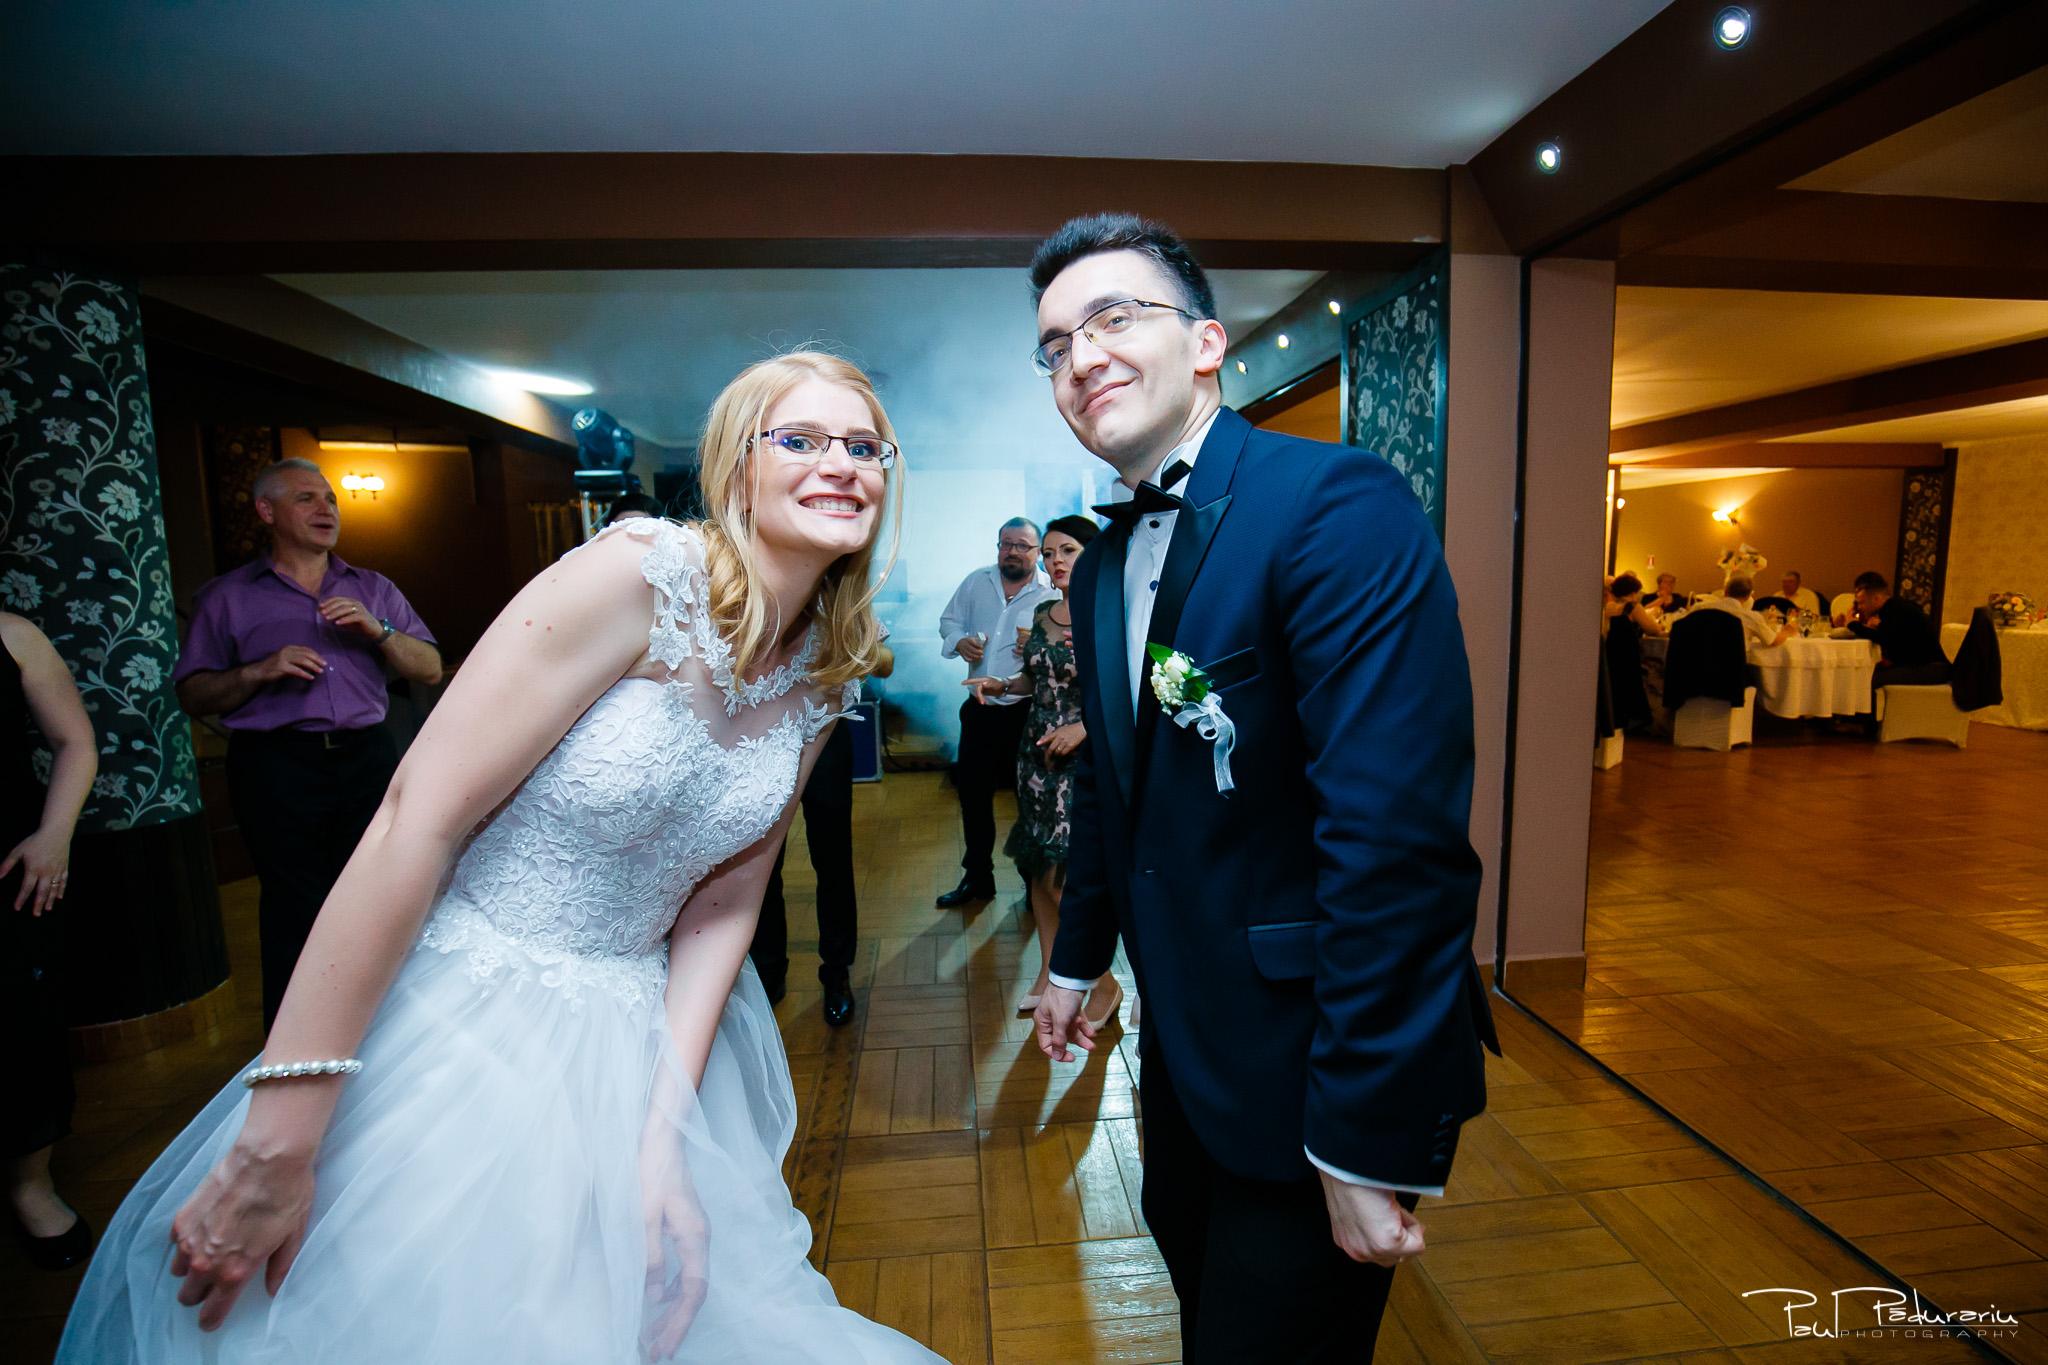 Anca si Razvan petrecere restaurant American Iasi - Paul Padurariu fotograf profesionist nunta iasi www.paulpadurariu.ro © 2018 Paul Padurariu 6